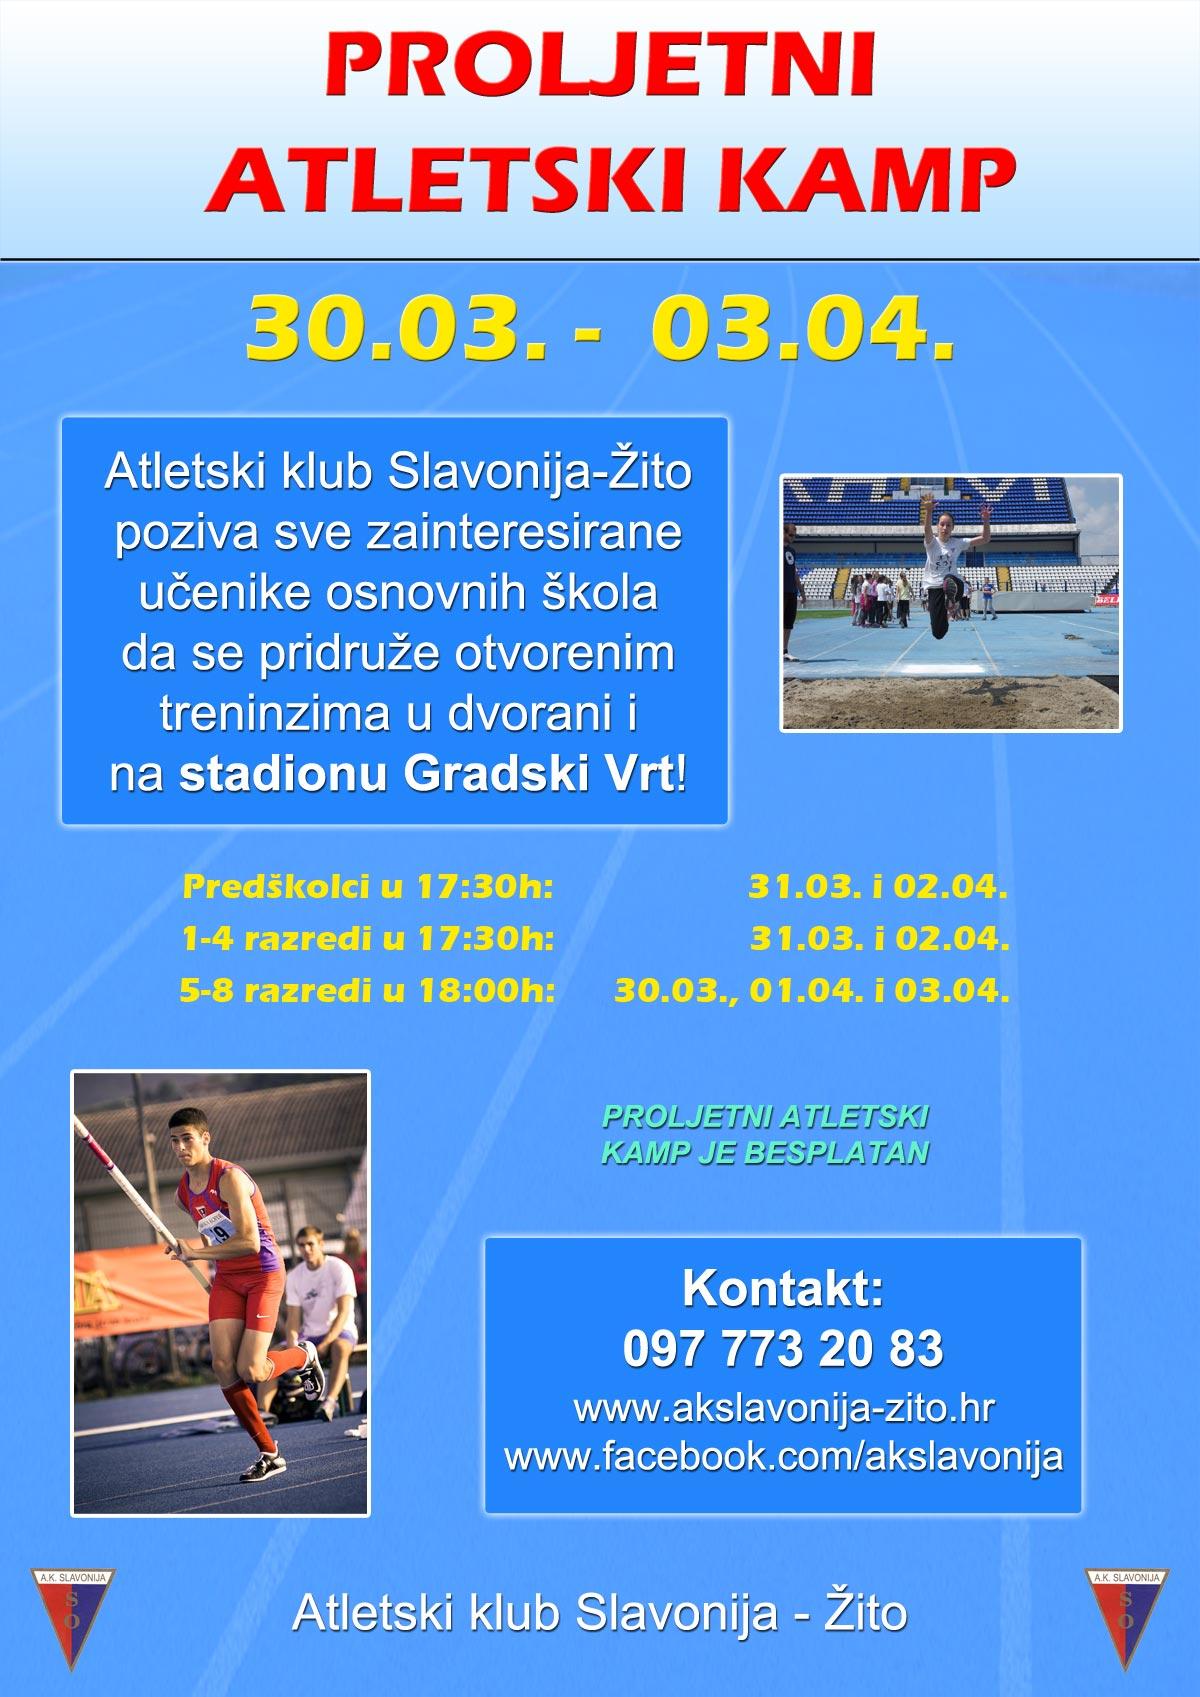 Plakat-Proljetni-atletski-kamp-2015